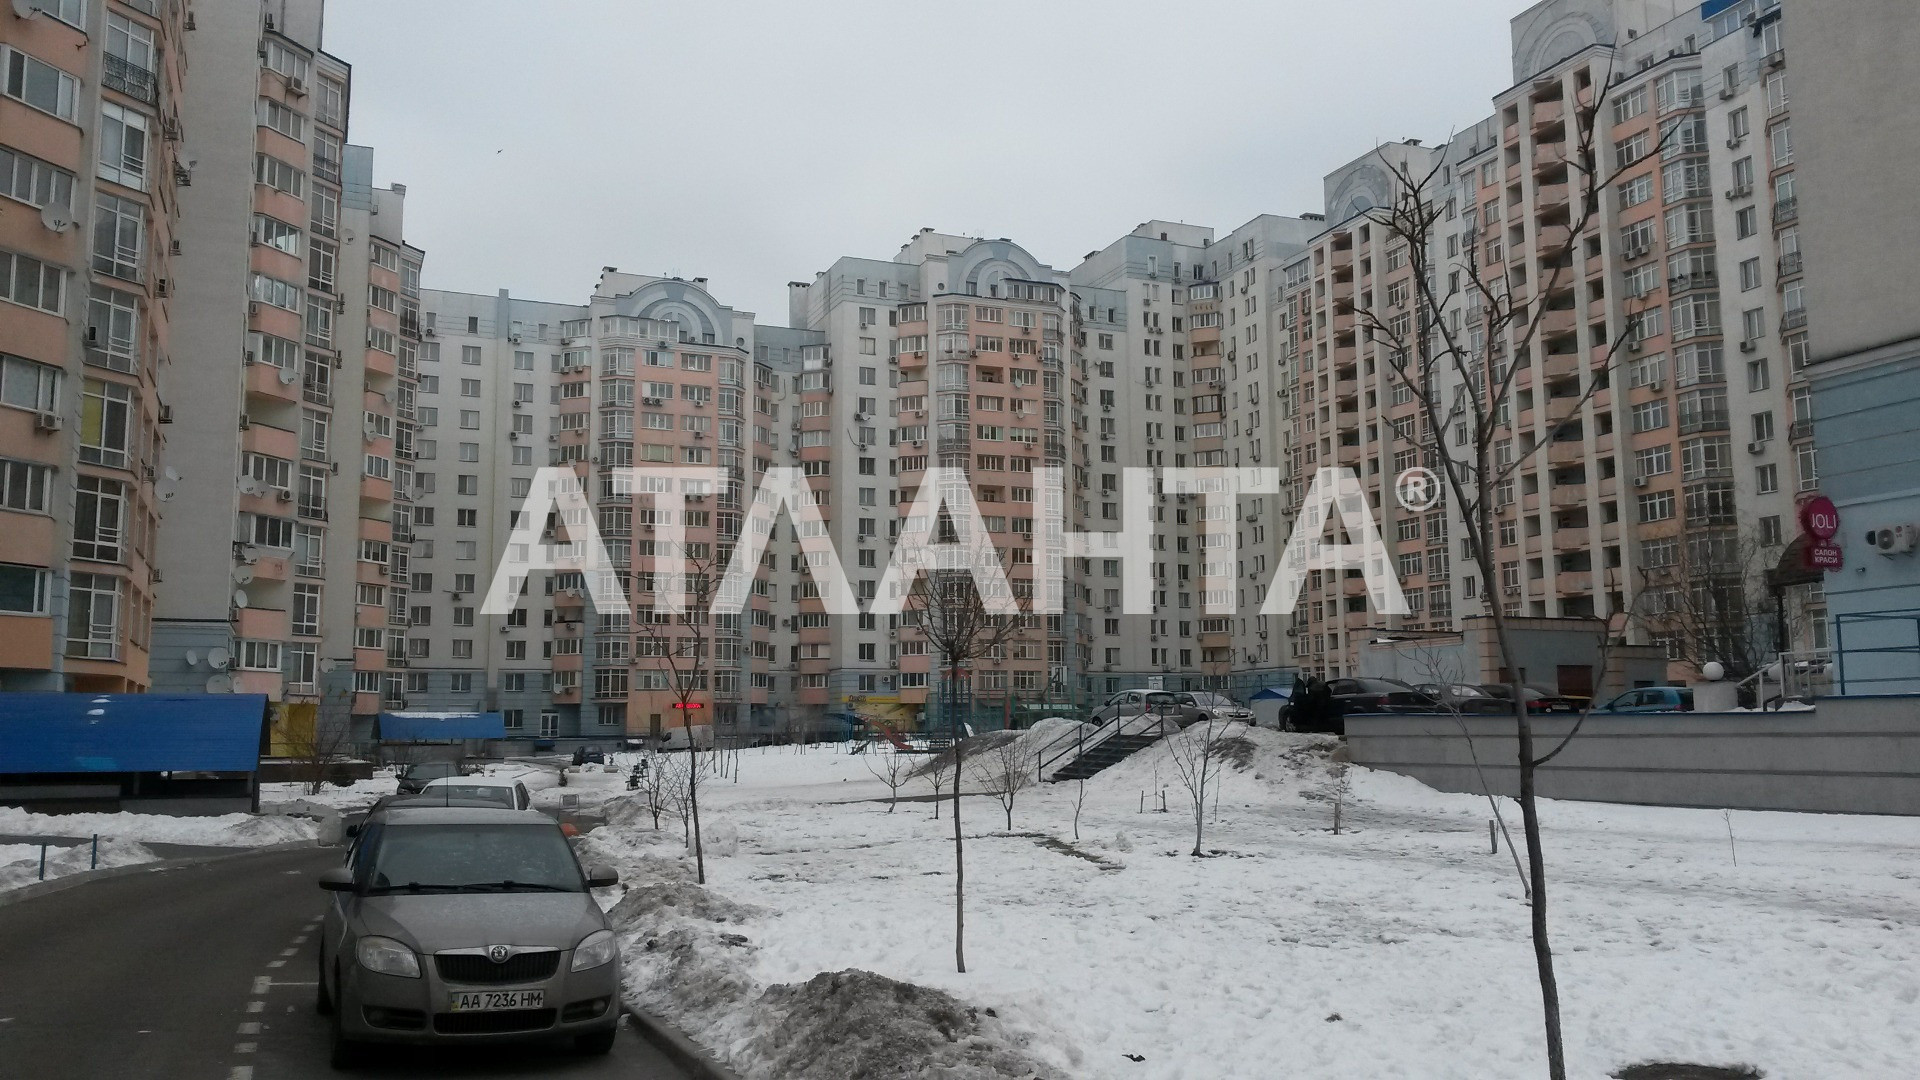 Продается 1-комнатная Квартира на ул. Ломоносова — 70 000 у.е. (фото №23)